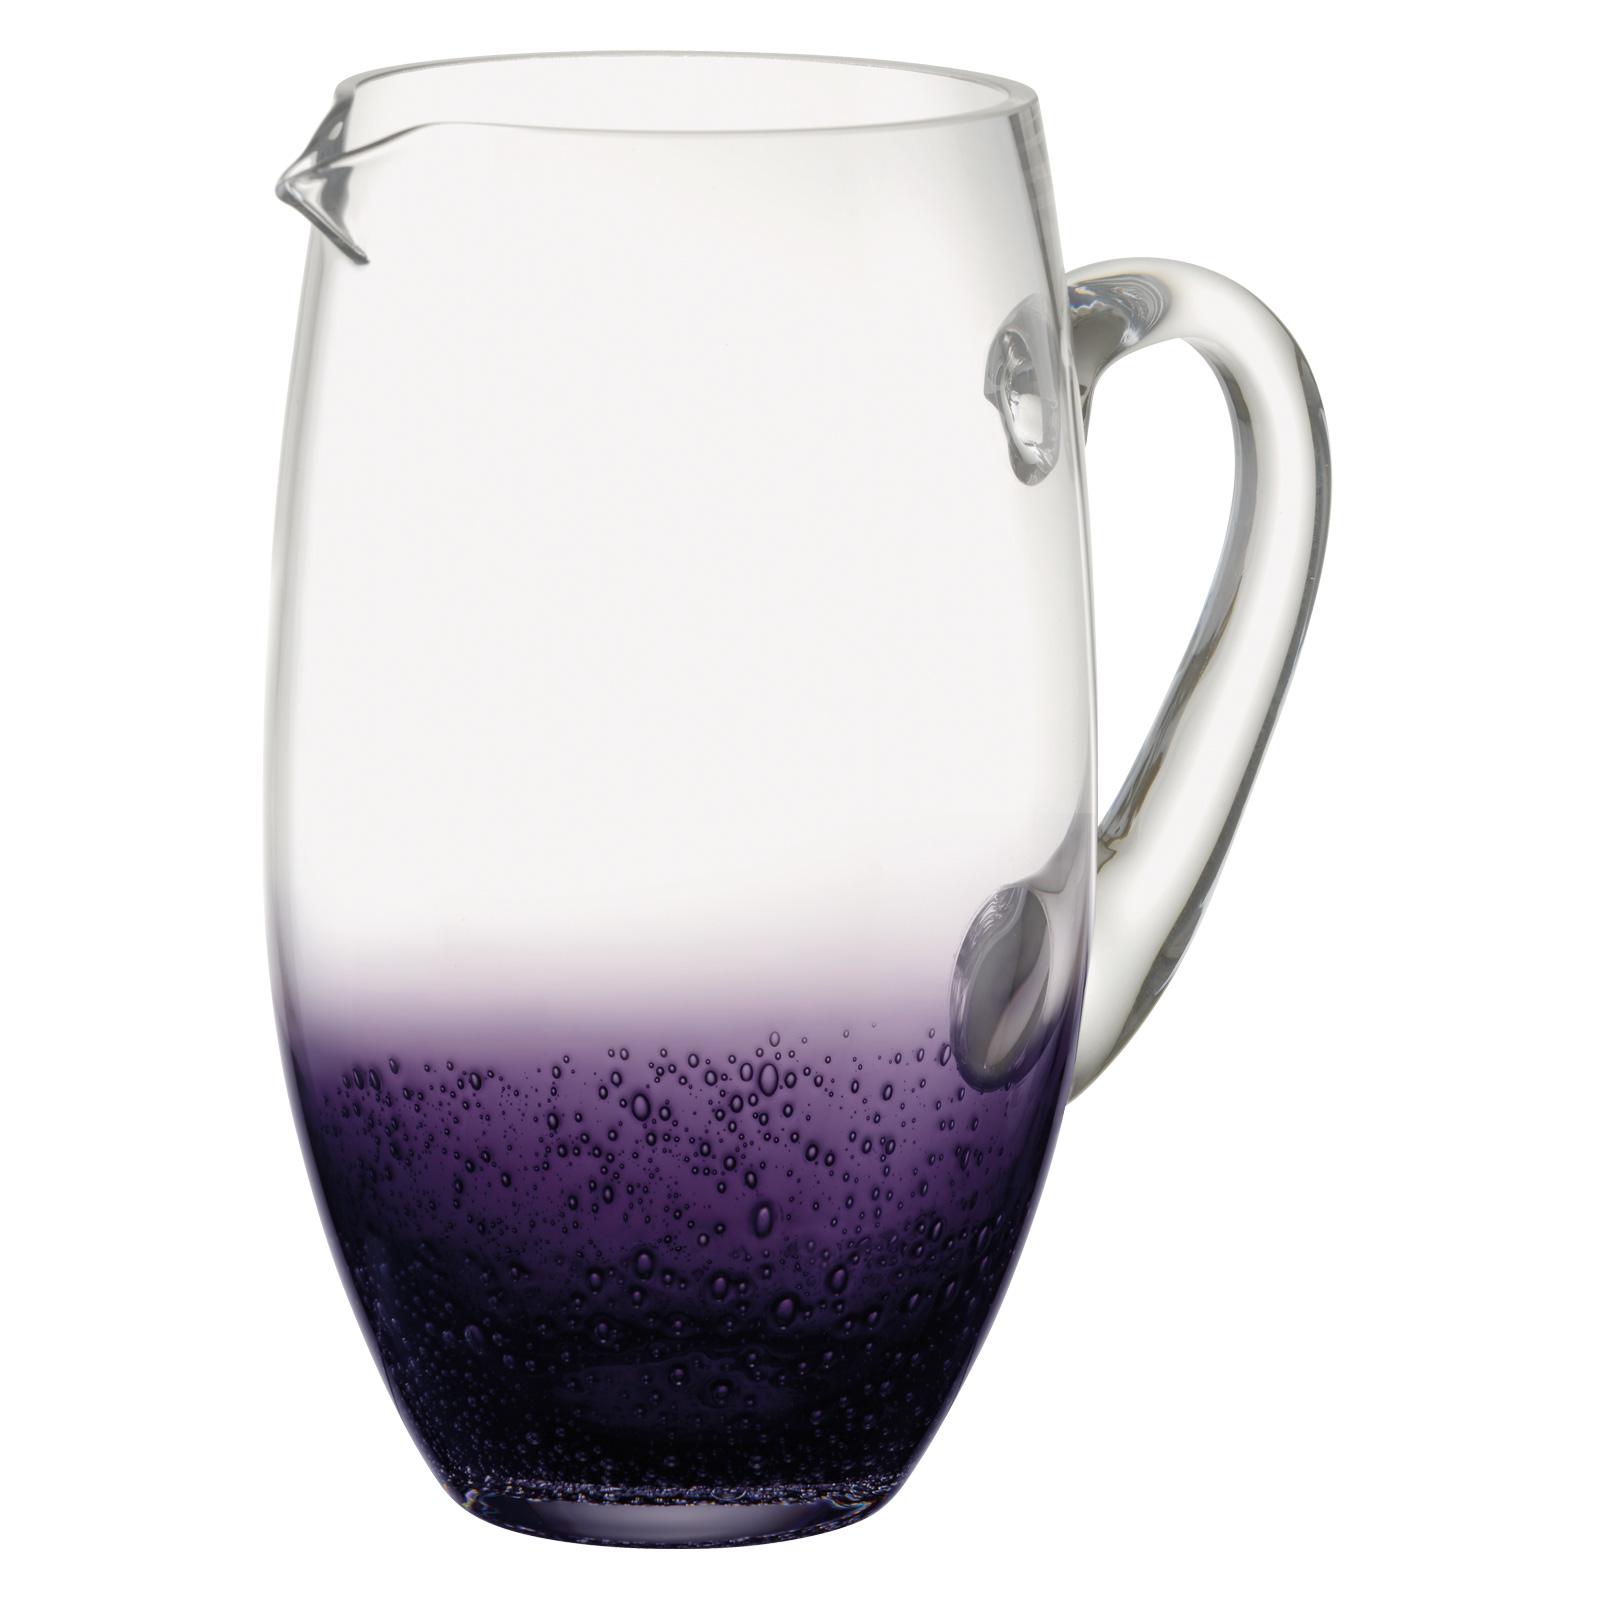 Fizz Purple Jug by Anton Studio Designs